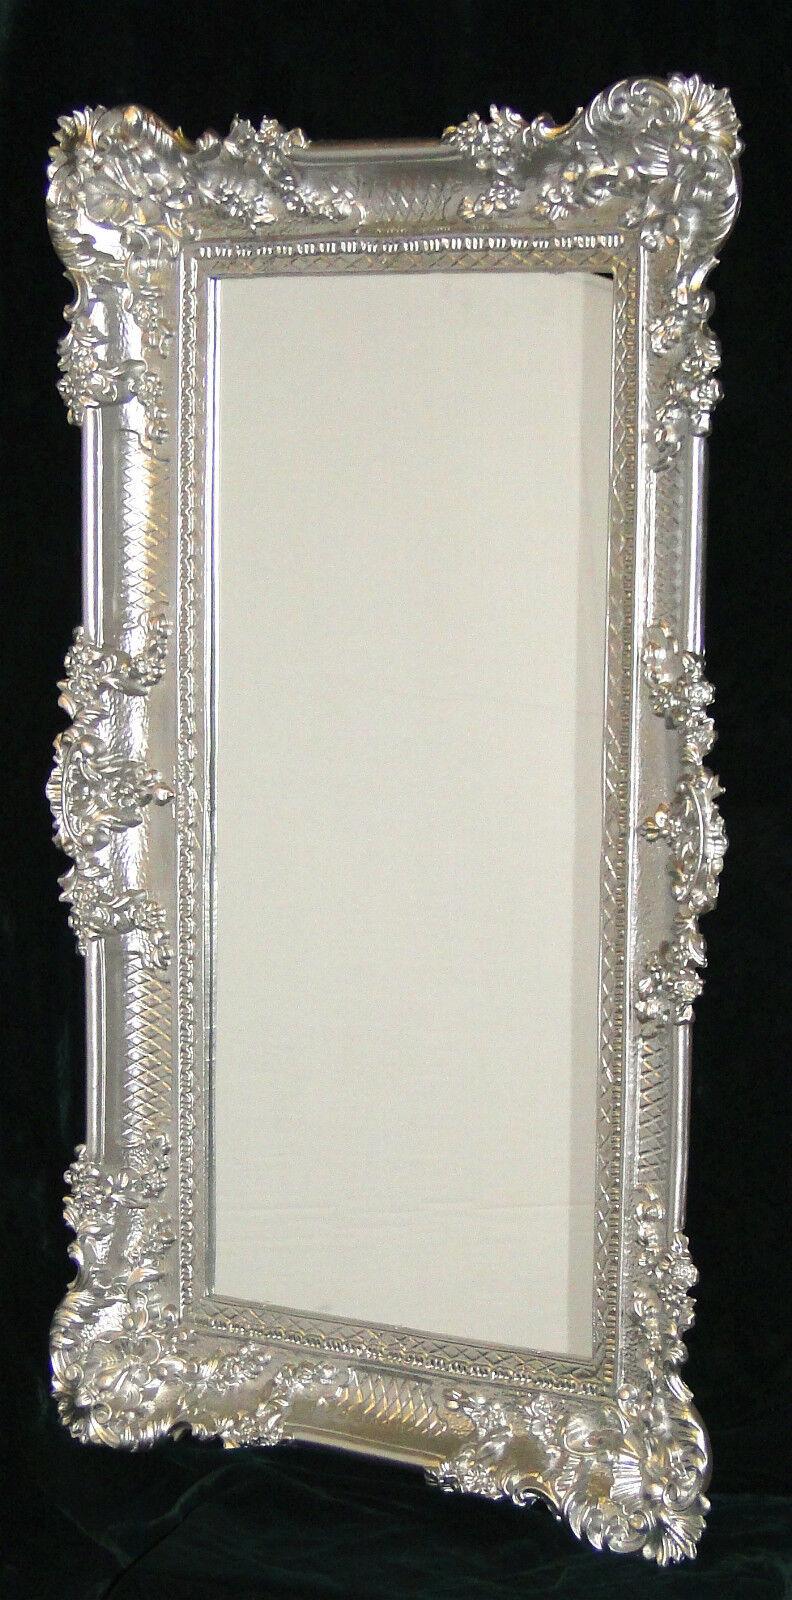 wandspiegel barock gro er spiegel silber hochglanz 97x57 bilderrahmen antik kaufen bei pintici. Black Bedroom Furniture Sets. Home Design Ideas